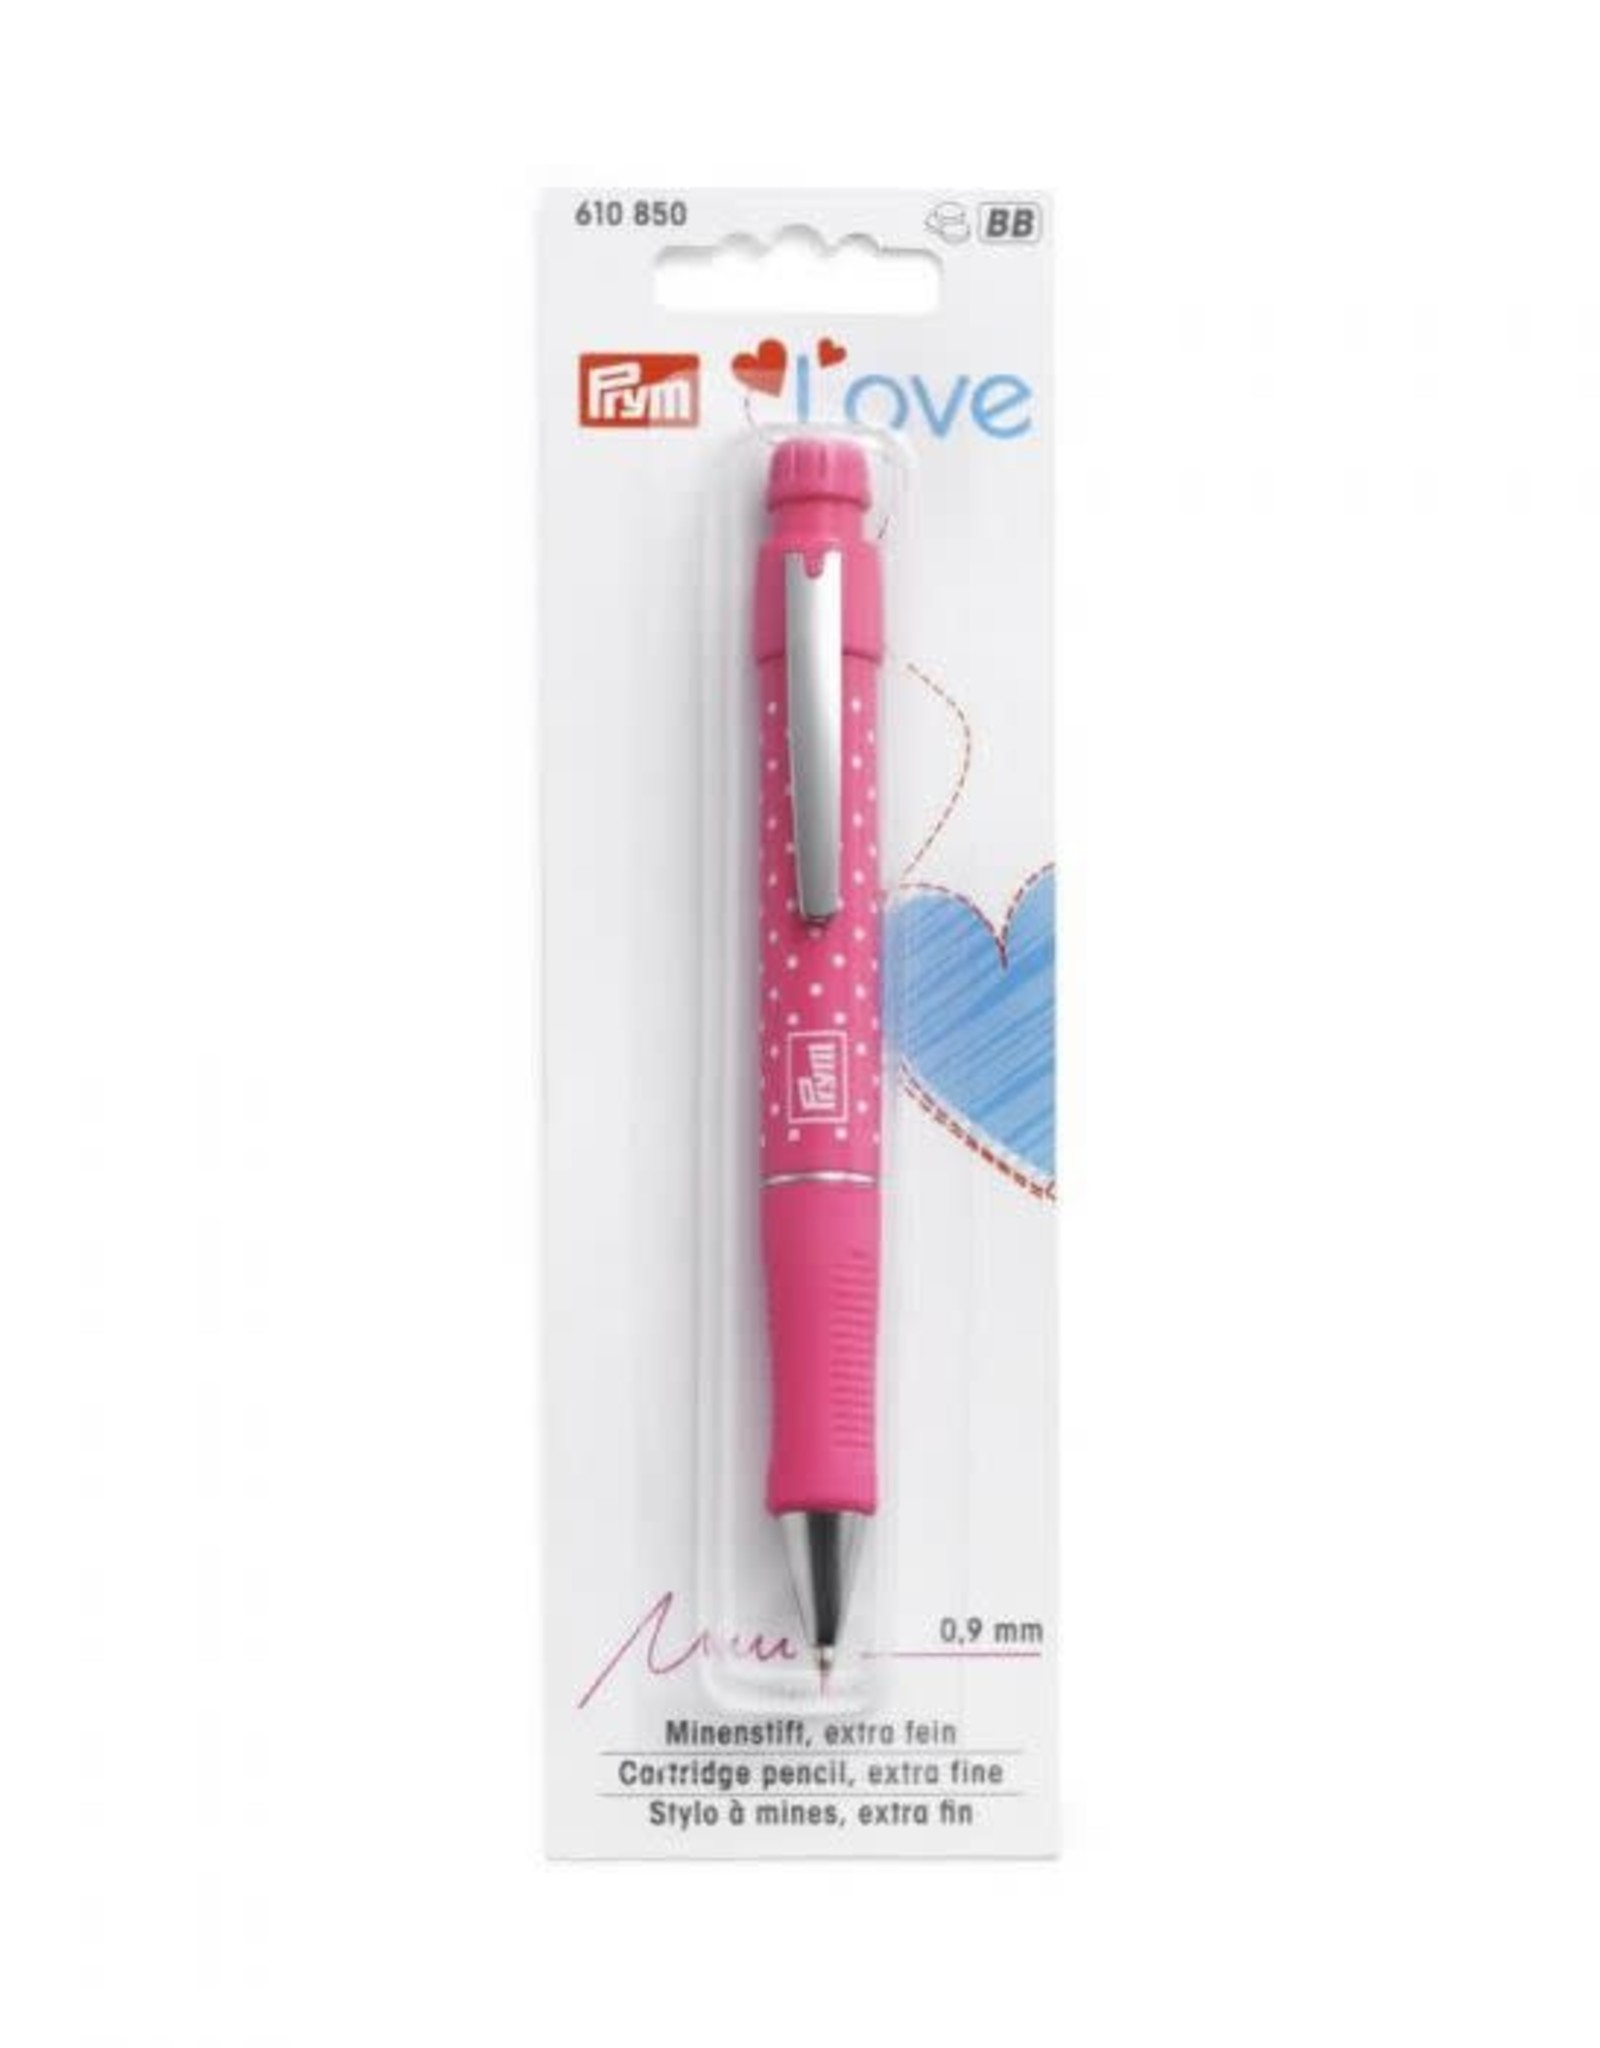 Prym Prym Love 610.850 - Vulpotlood Pink